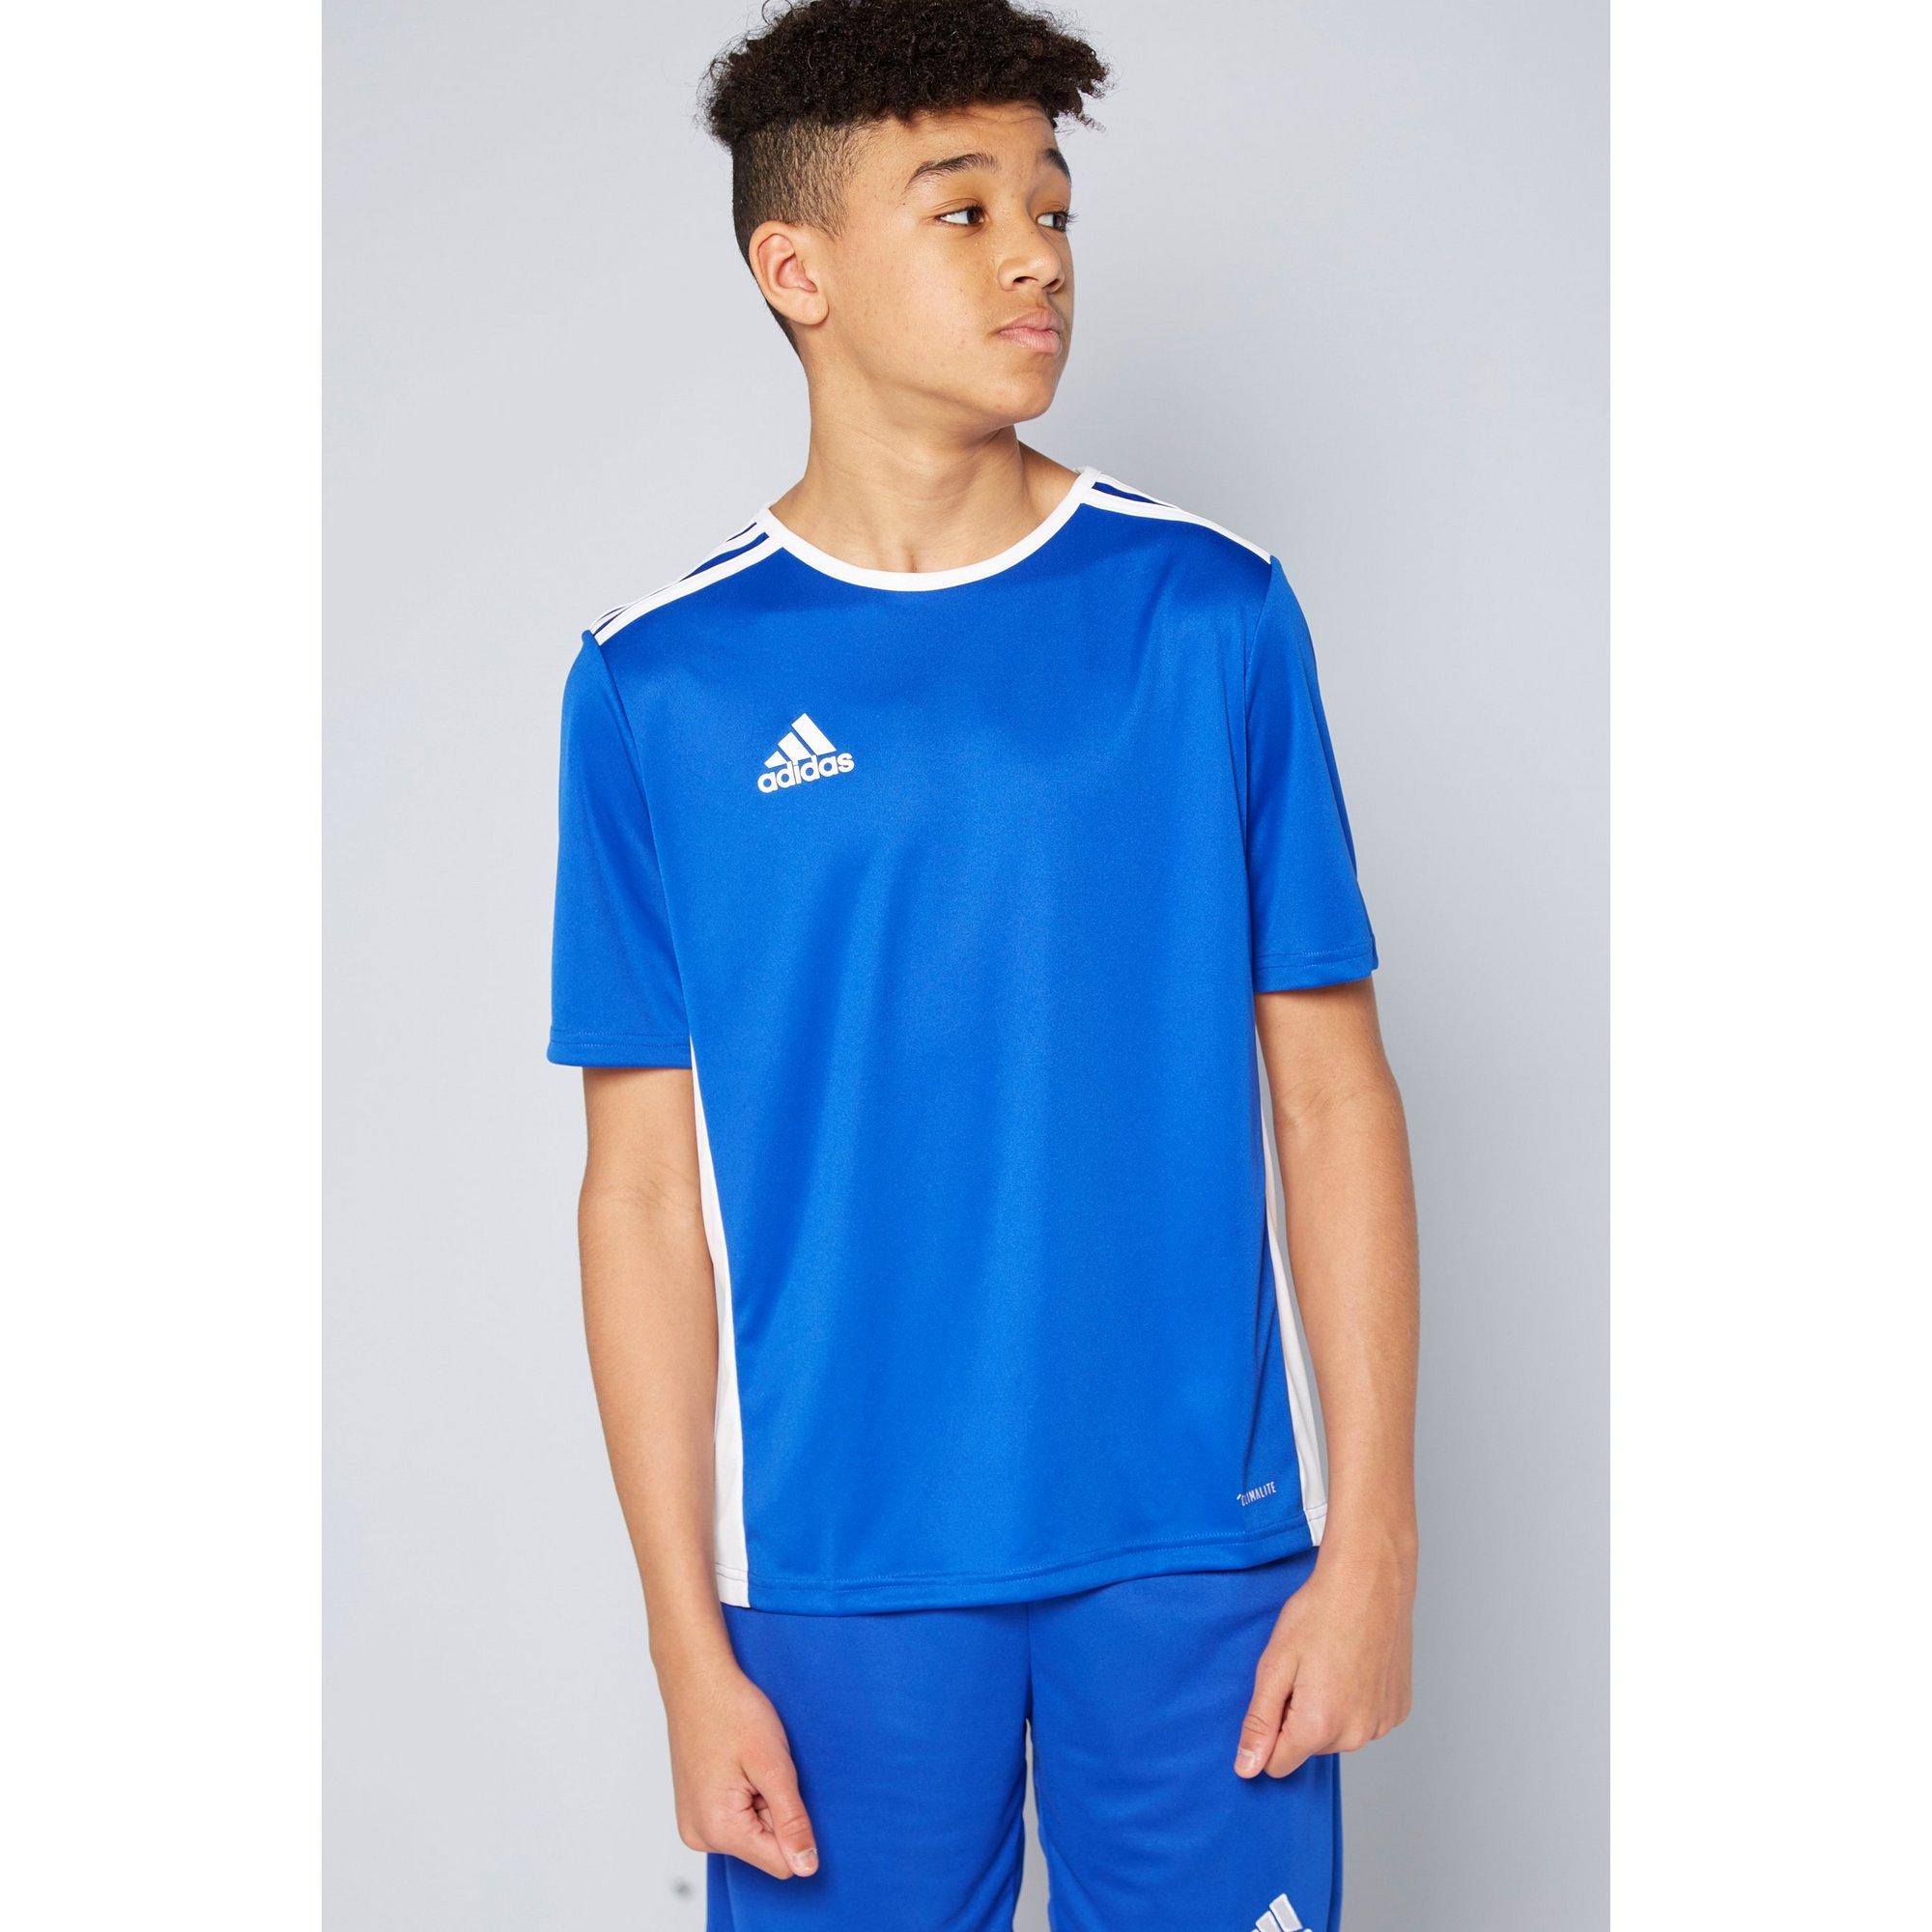 Image of Boys adidas Entrada T-Shirt